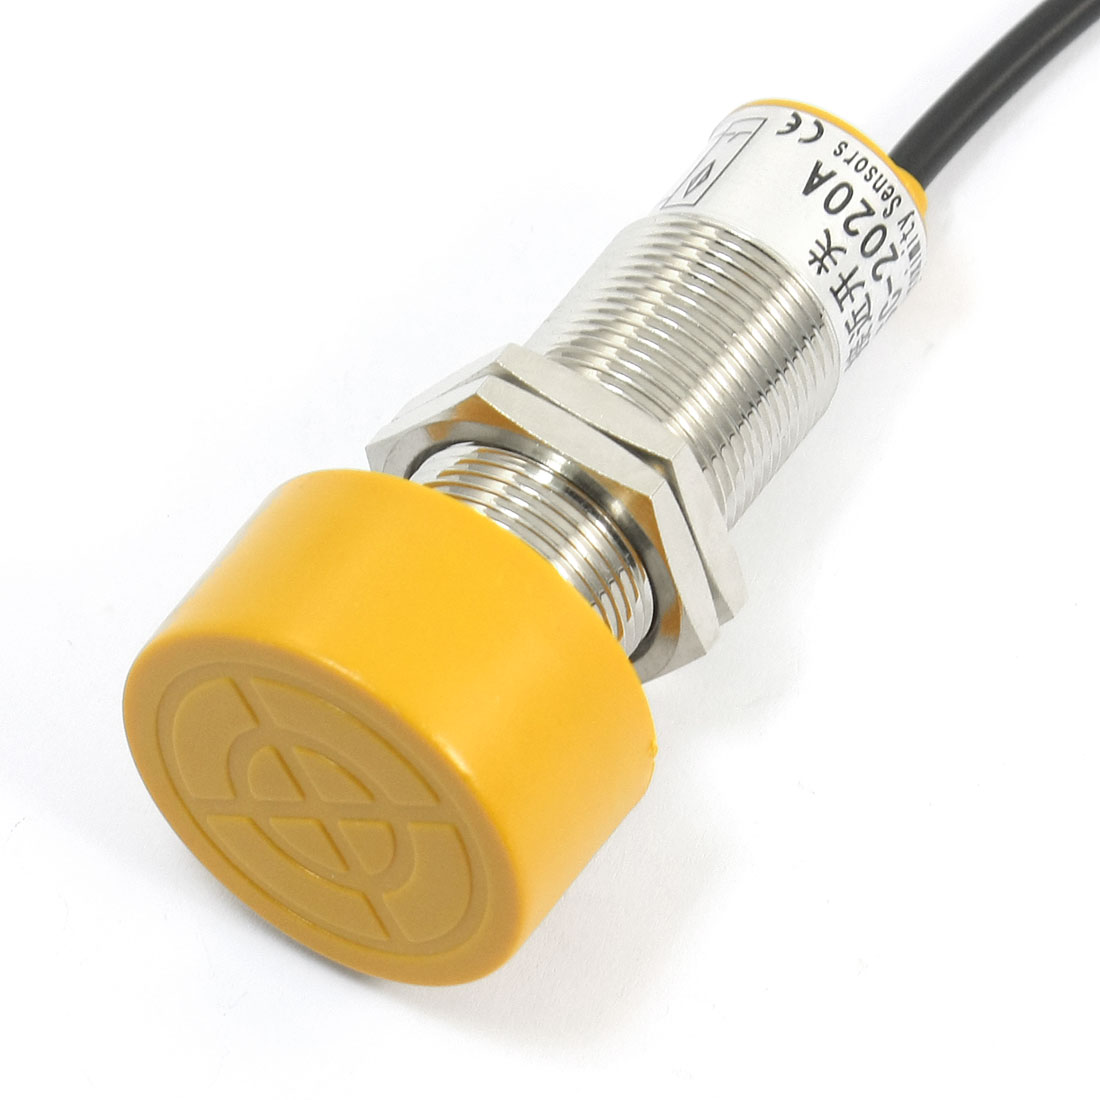 SC-2020A 24mm Thread 20mm Detect Inductive Sensor Proximity Switch AC 24-240V